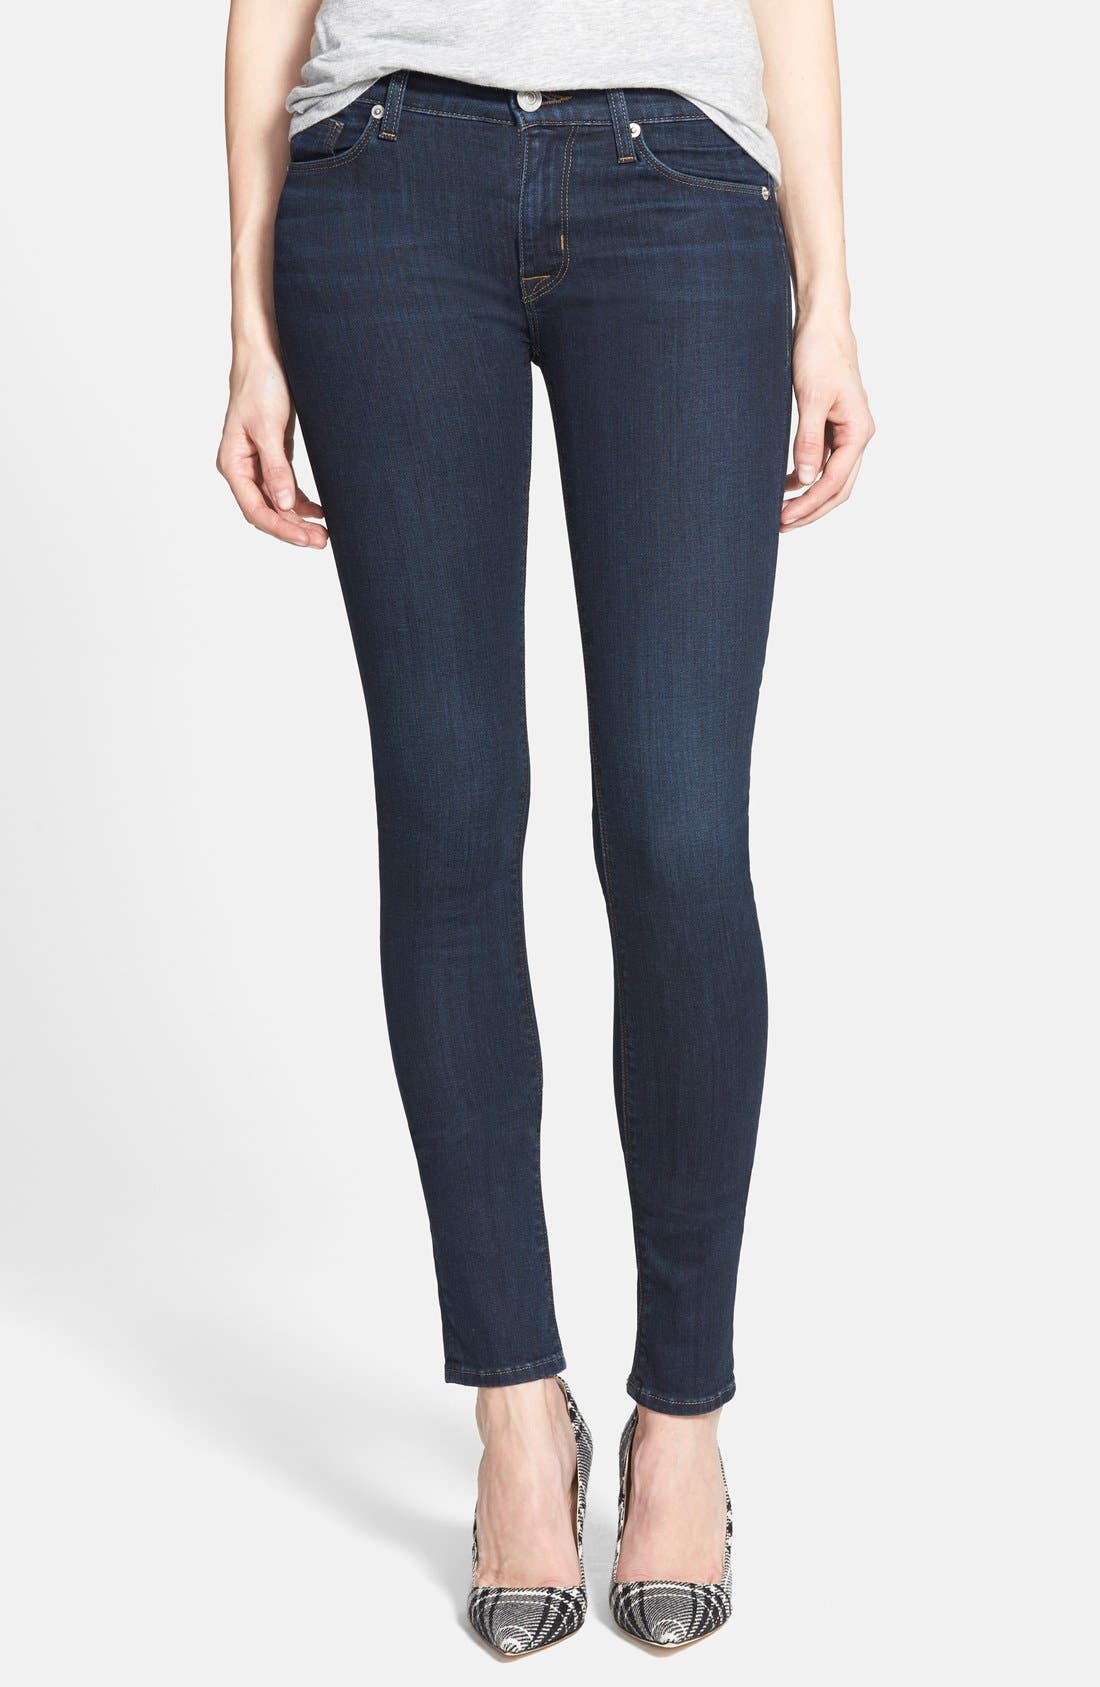 Alternate Image 1 Selected - Hudson Jeans Mid Rise Skinny Jeans (Problem Child)